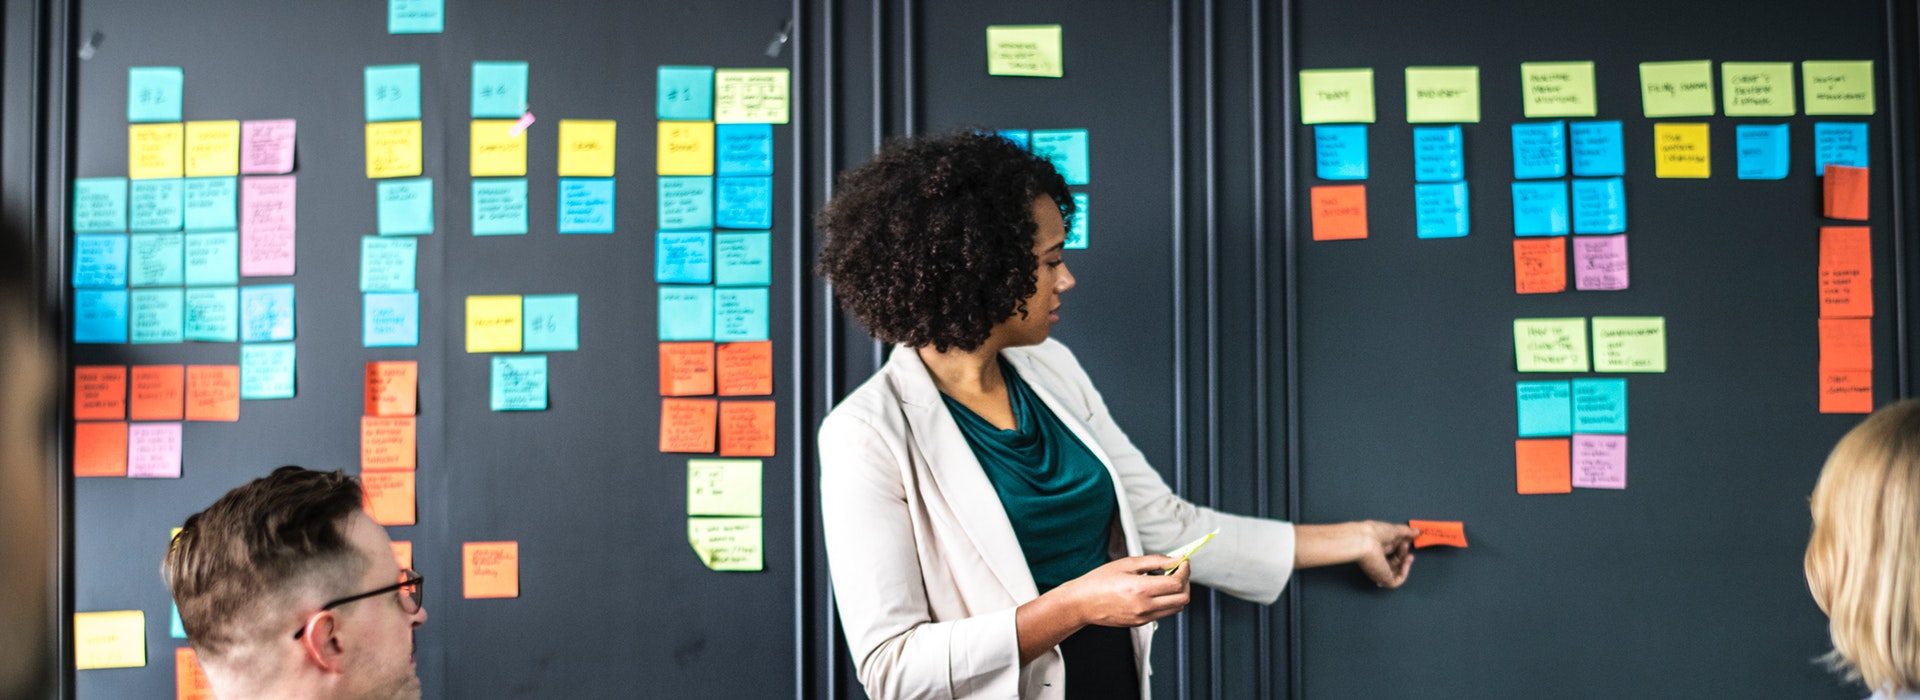 A woman in a beige blazer presents at a black wall covered in brightly-coloured post-it notes, while two coworkers look on. Capture d'écran d'un manuel numérique montrant un lien vers un questionnaire interactif